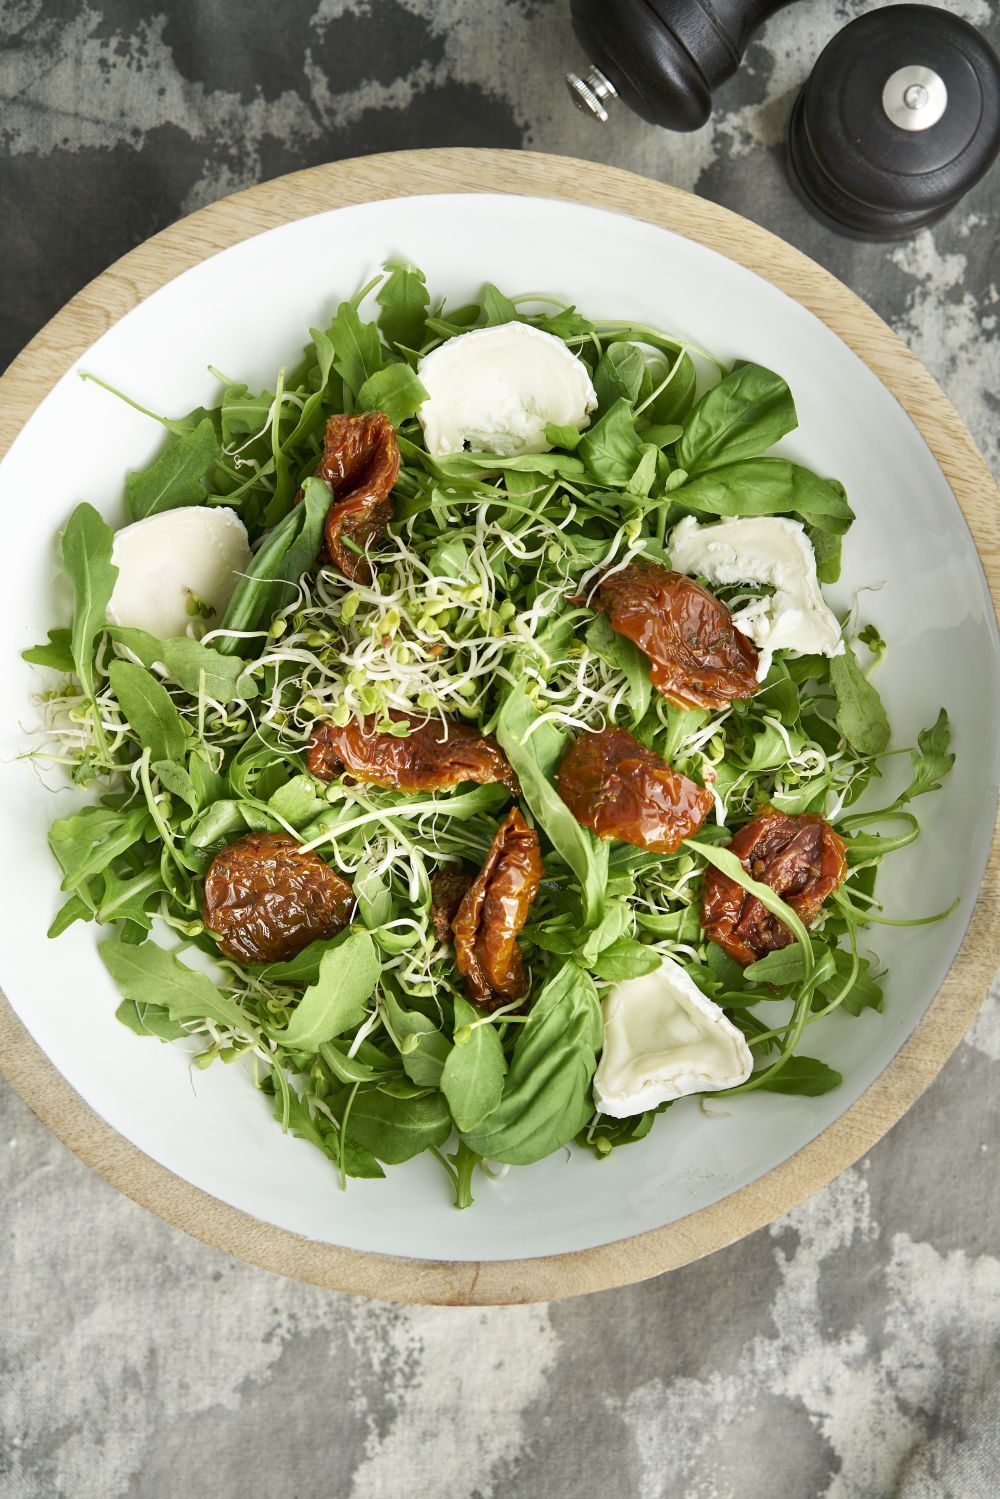 Las verduras, crudas, cocidas, asadas o en puré, también están...